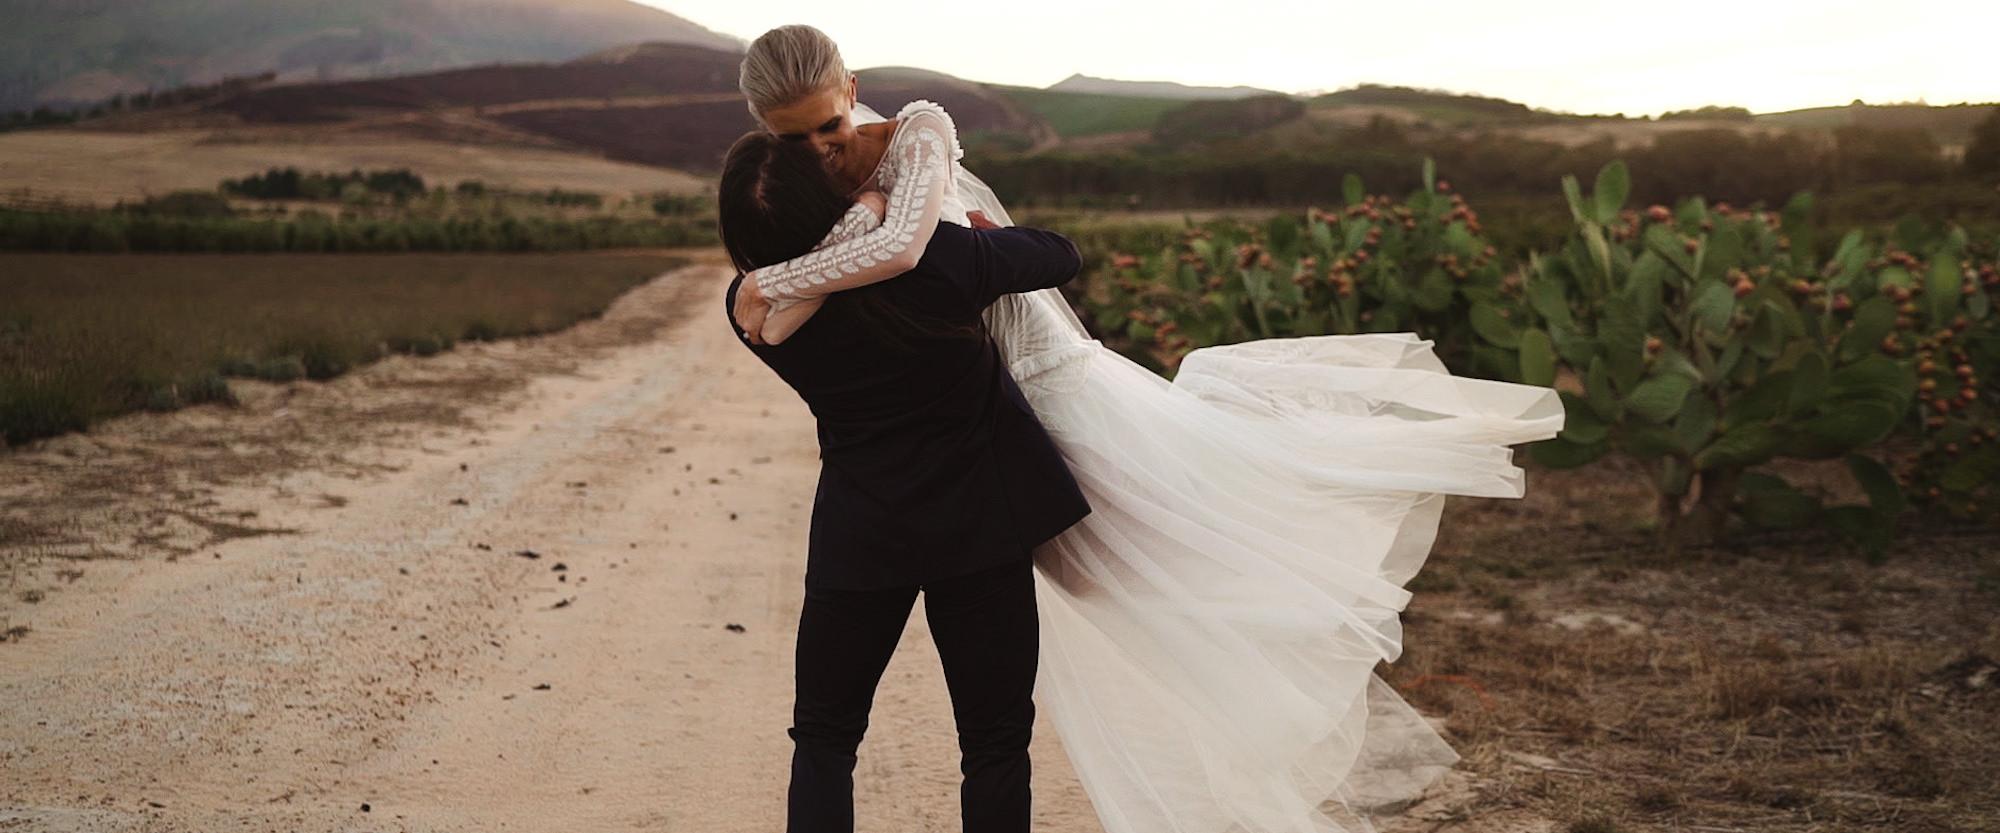 HeathEmelieWeddingFilm_Babylonstoren_Wedding_15.jpg